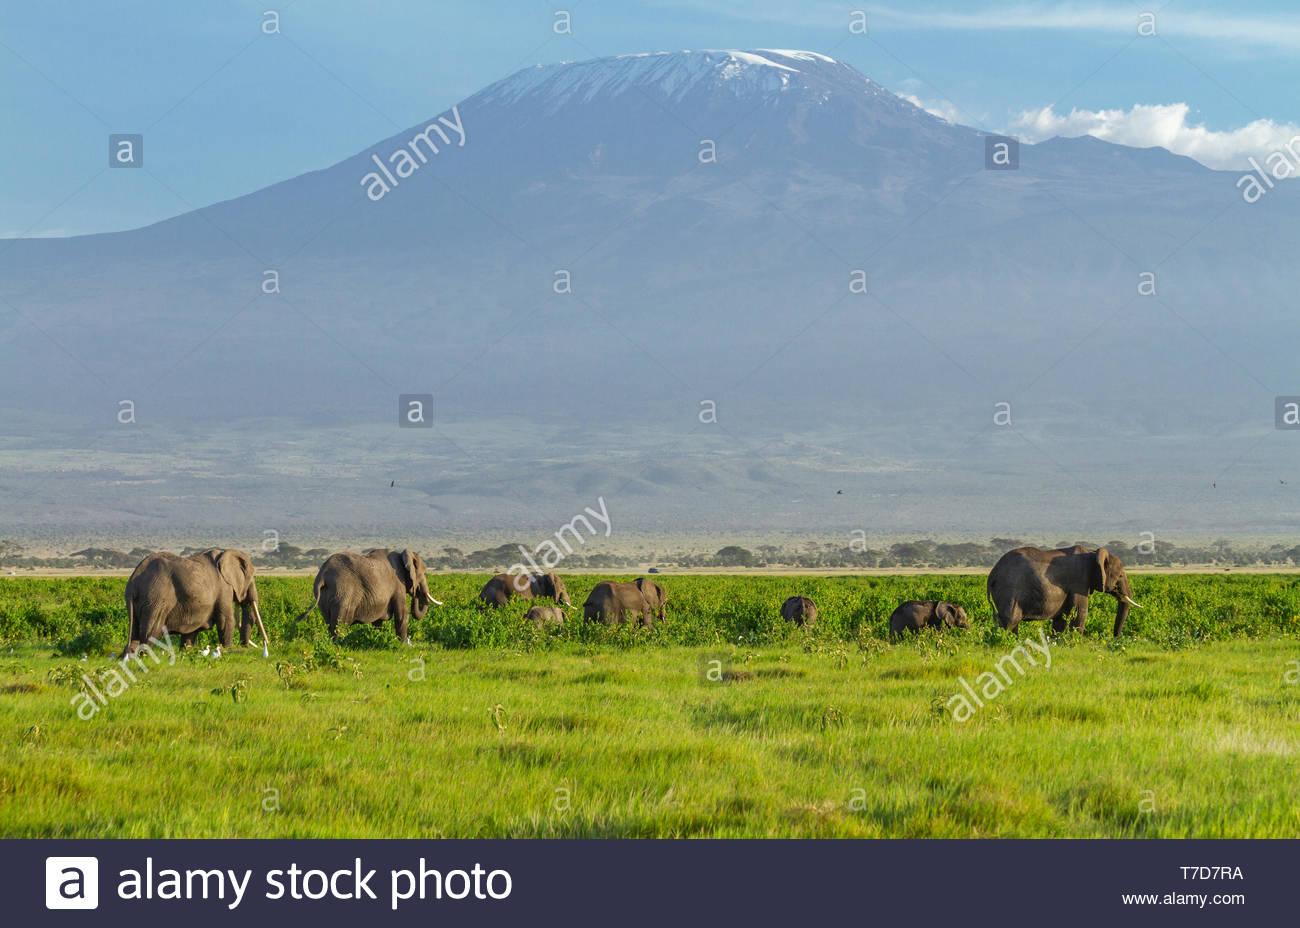 Elephant herd tuskers baby calves Loxodonta Africana front of Mount Kilimanjaro Amboseli Kenya East Africa blue sky wallpaper screensaver background - Stock Image